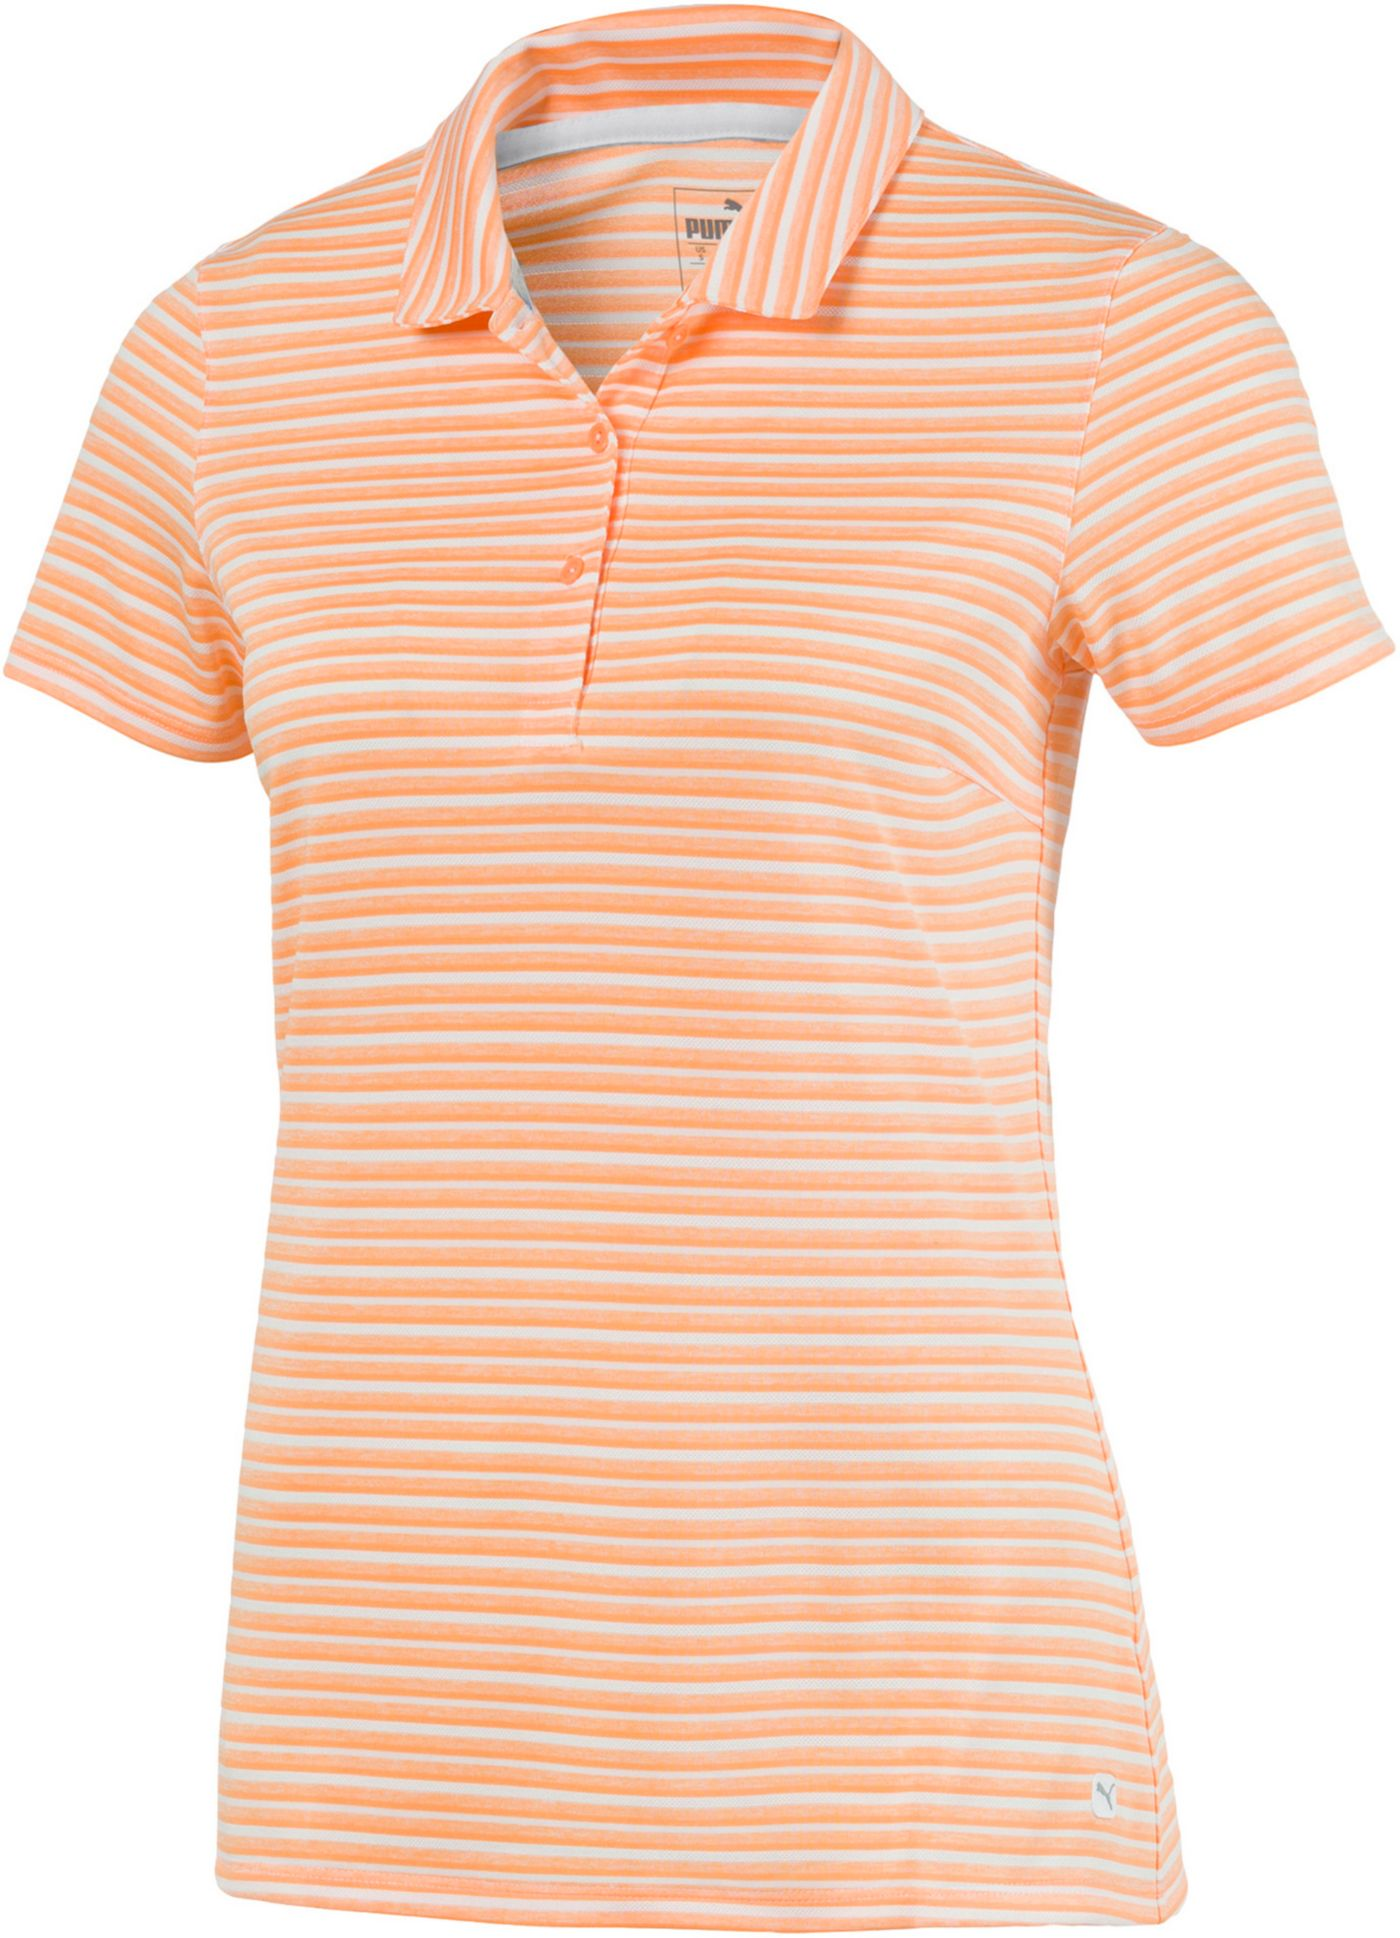 PUMA Women's Links Short Sleeve Golf Polo